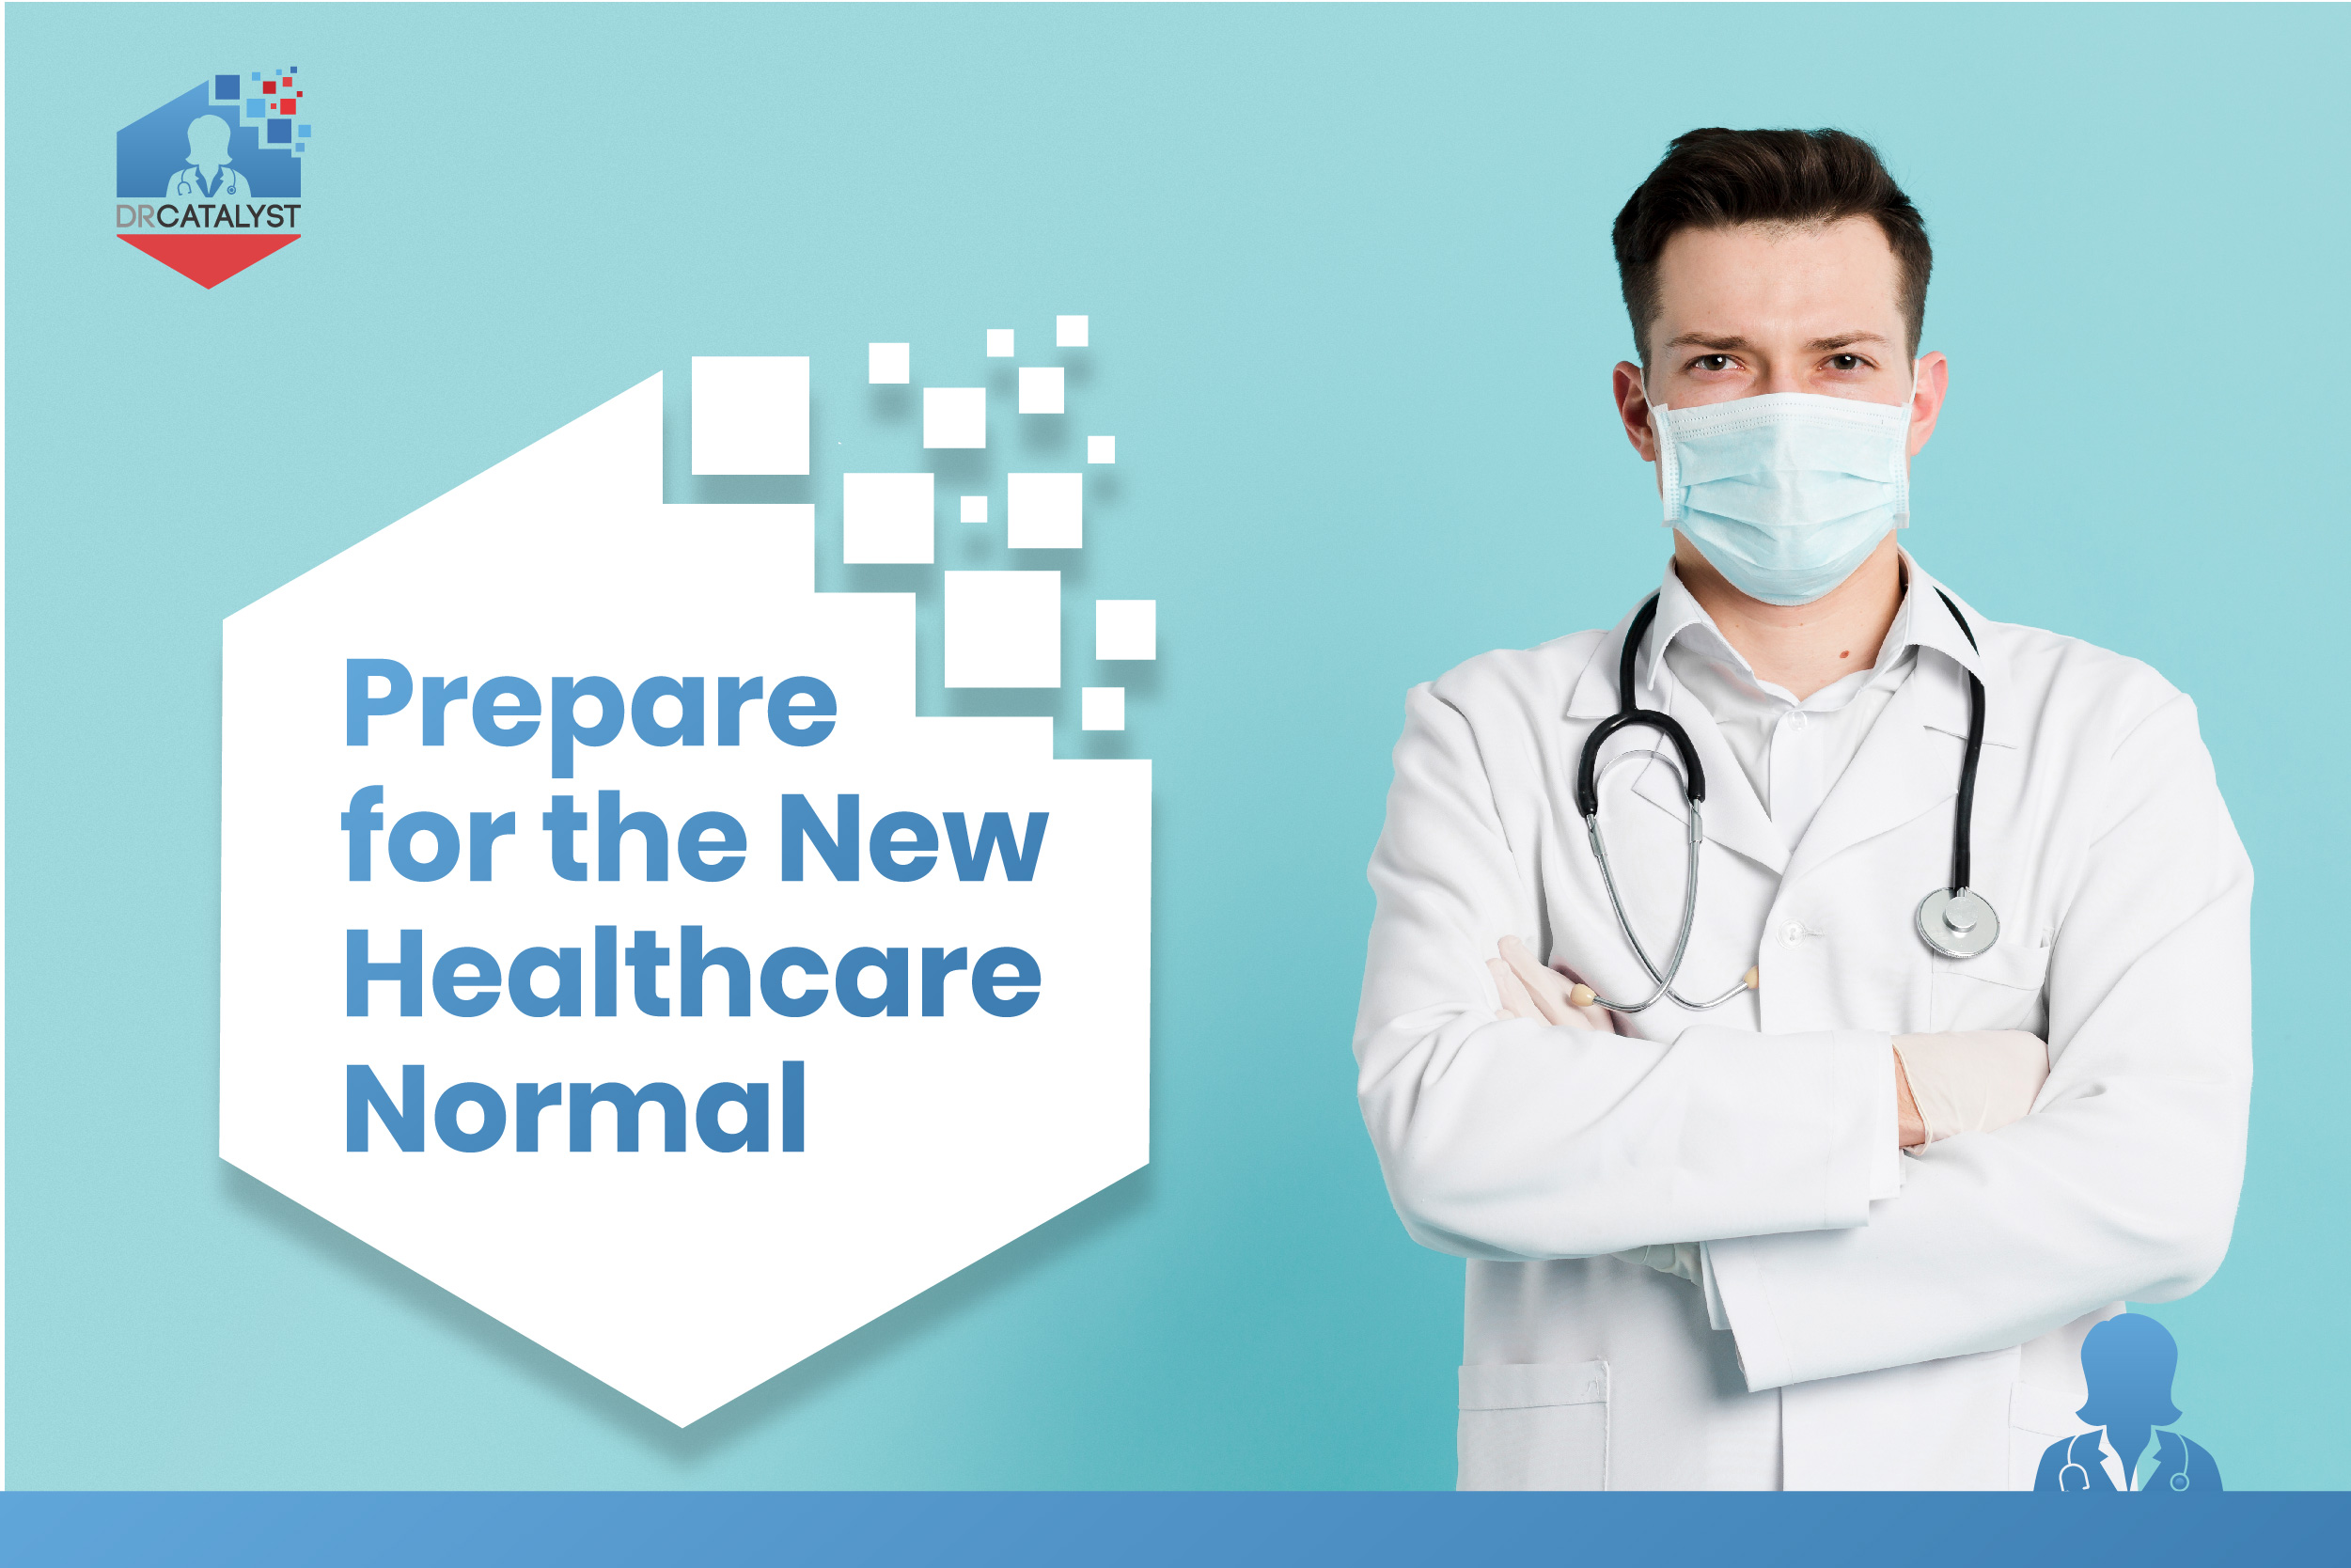 Prepare for the New Healthcare Normal